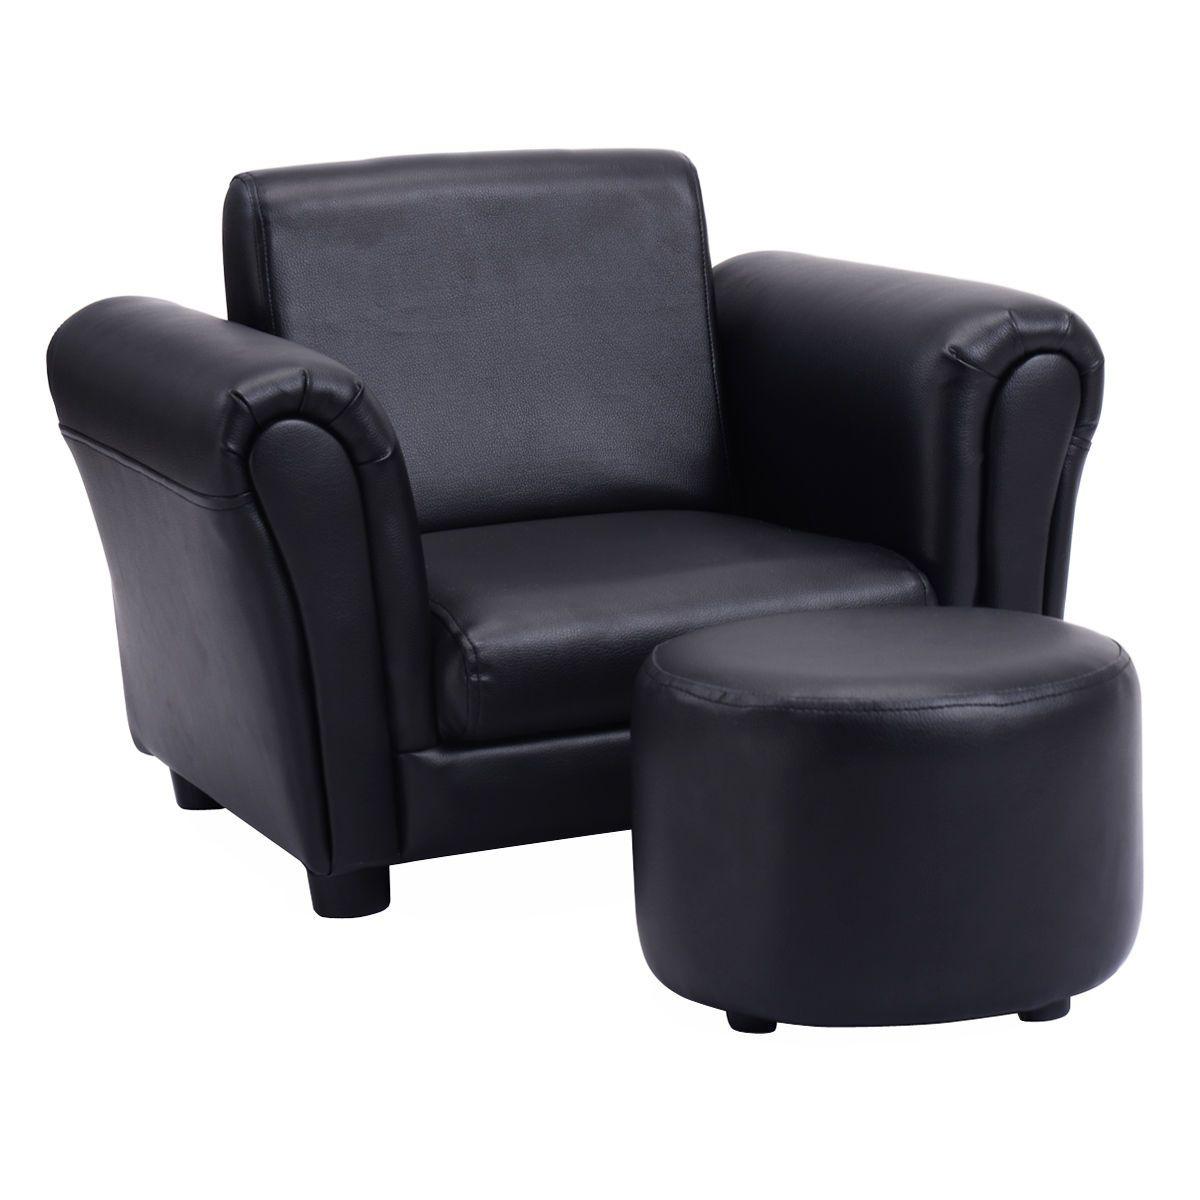 Black Kids Sofa Armrest Chair Couch Children Toddler Birthday Gift W Ottoman Kids Sofa Kids Sofa Chair Kids Chairs